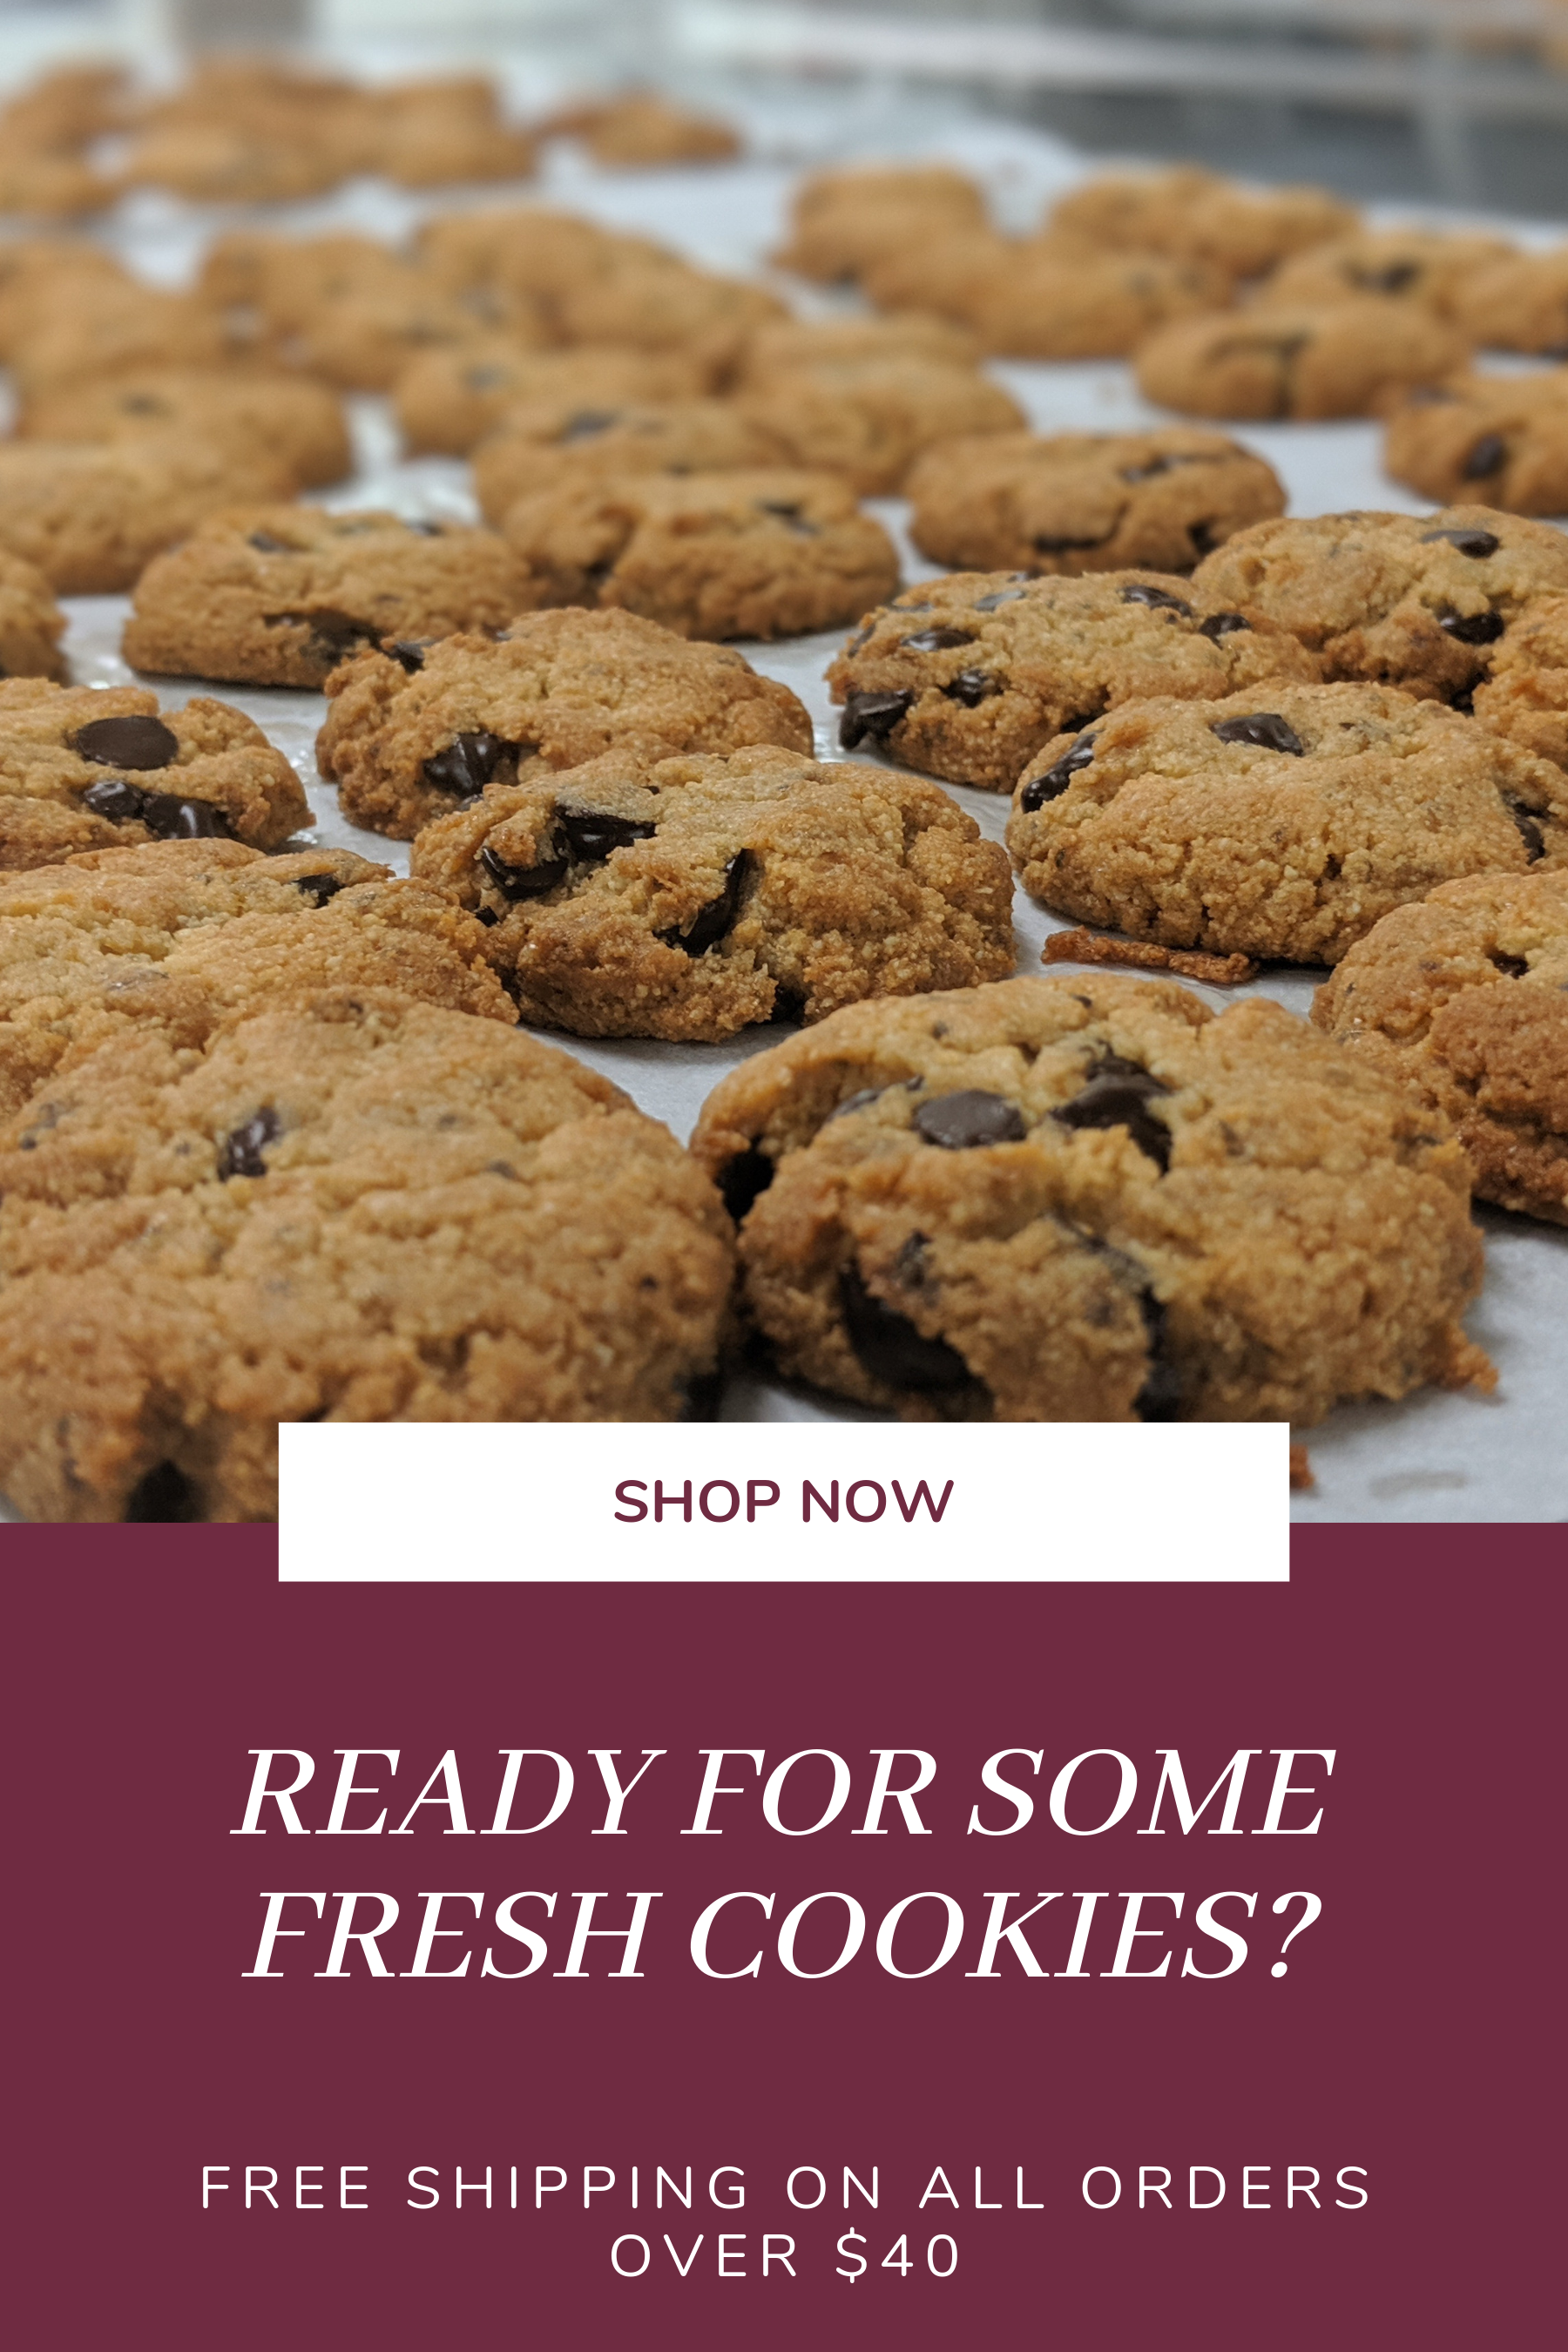 ChipMonk Baking Keto Low Carb Gluten Free Chocolate Chip Cookies.png